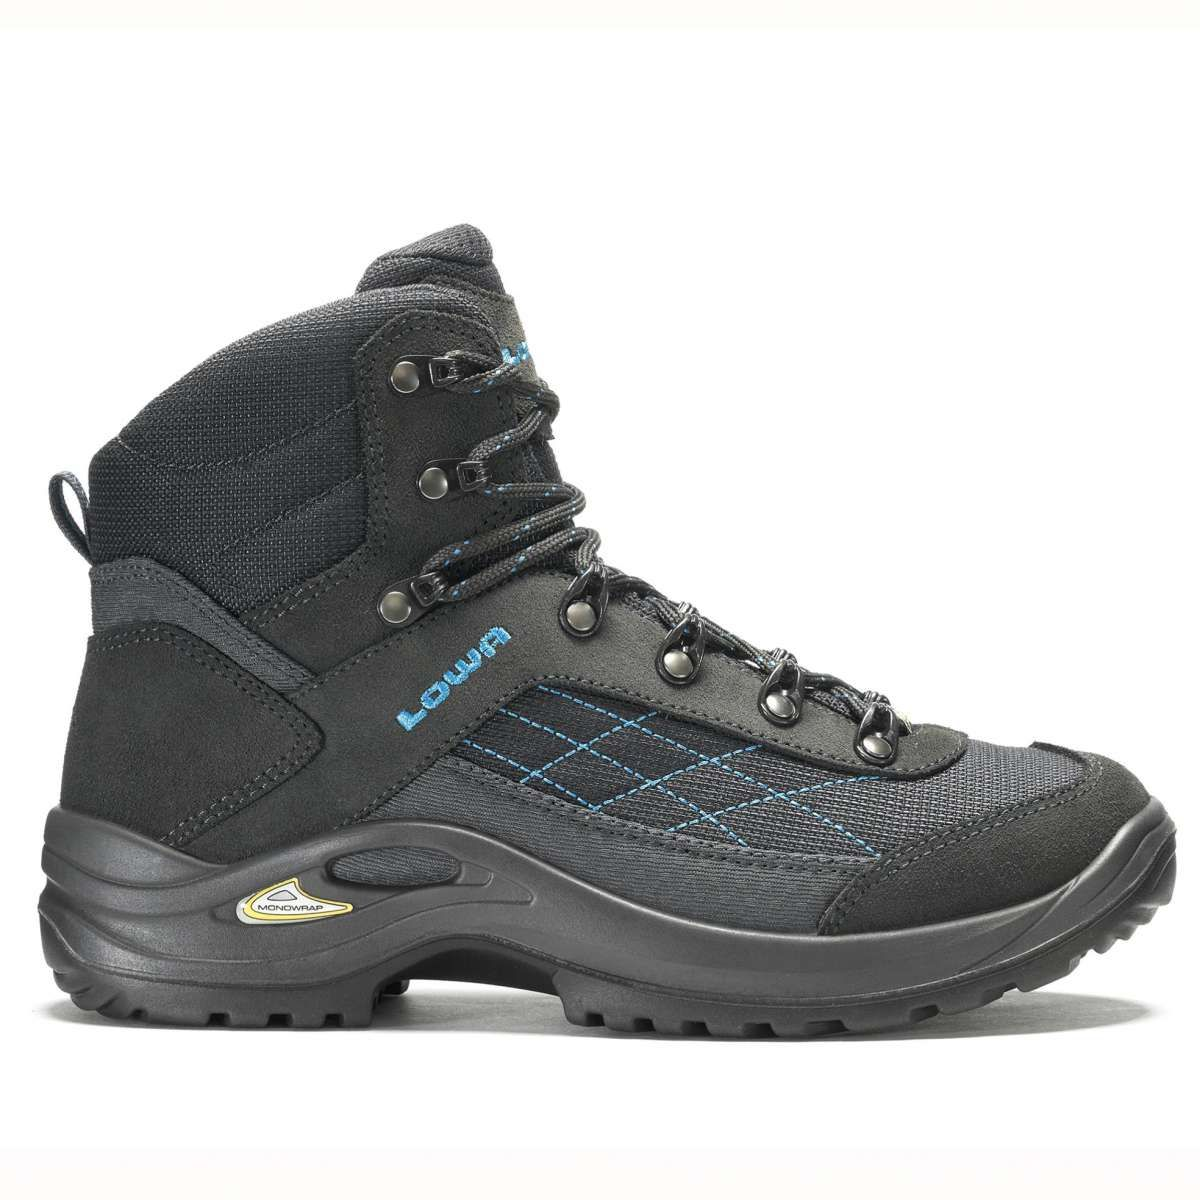 Taurus GTX Mid Ws Wanderschuhe | lowa | Hiking Boots, Boots